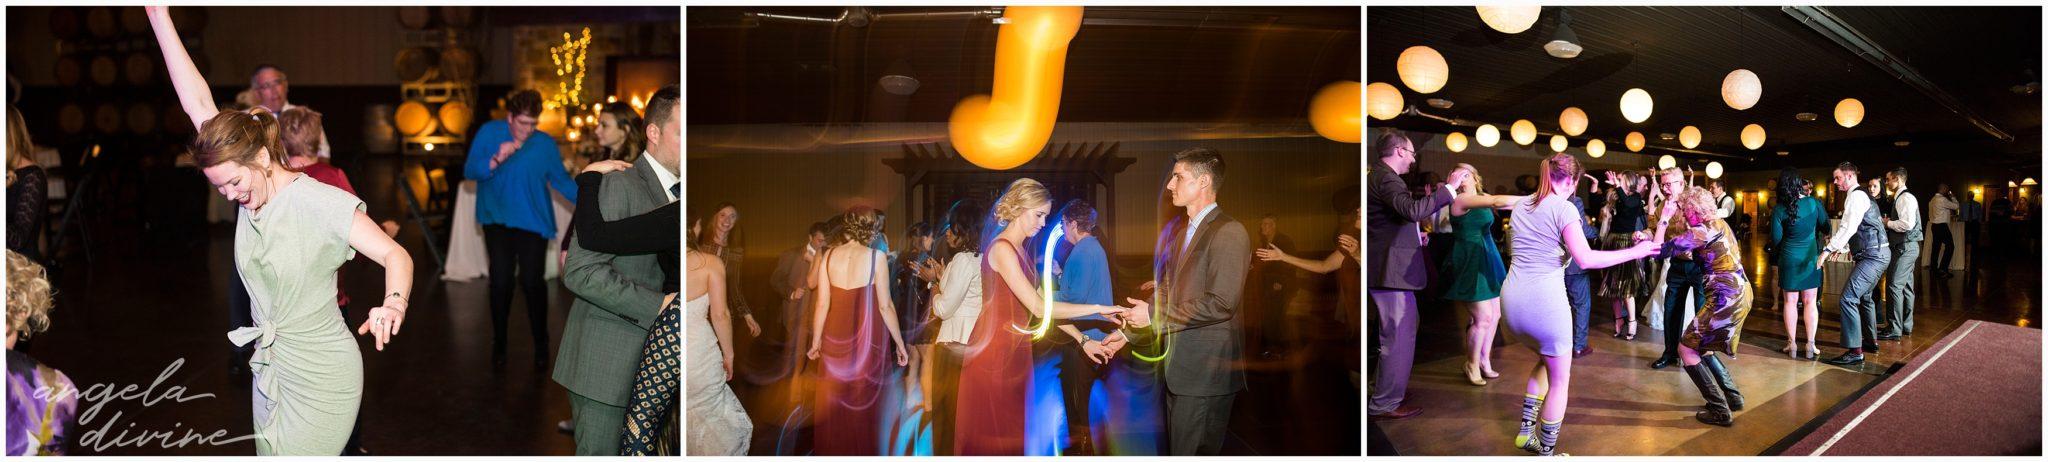 Carlos Creek Winery wedding dance party